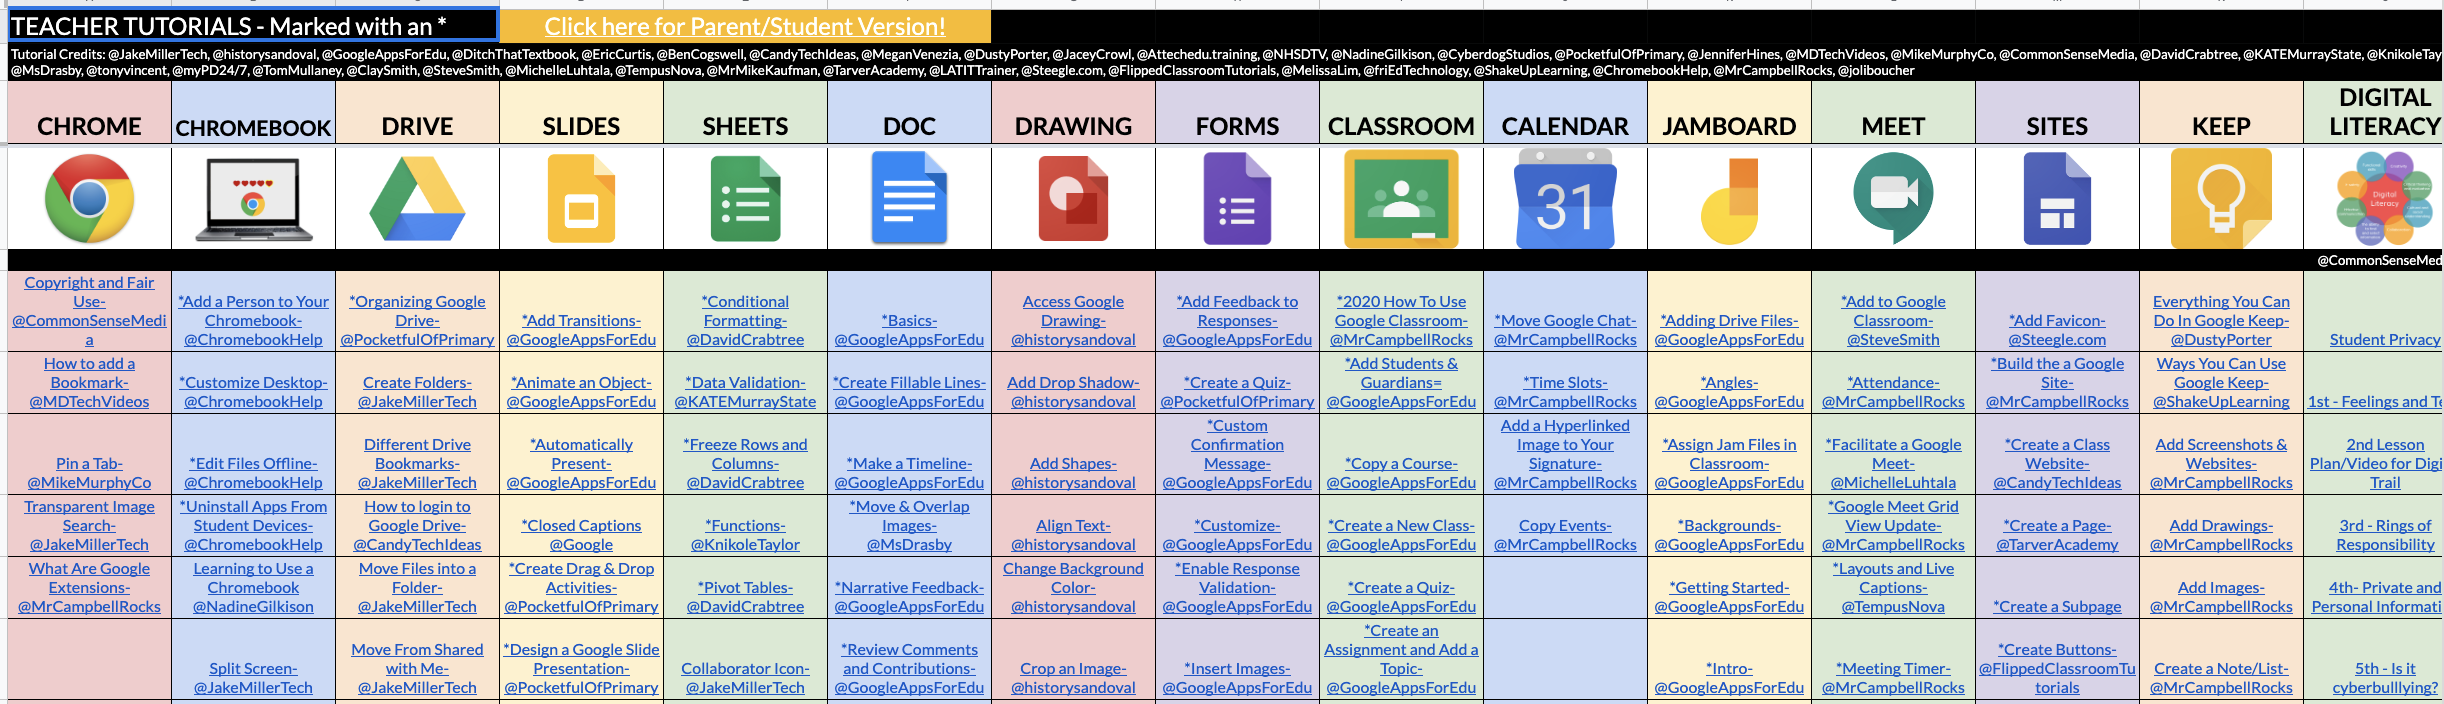 Teacher Tutorial Spreadsheet